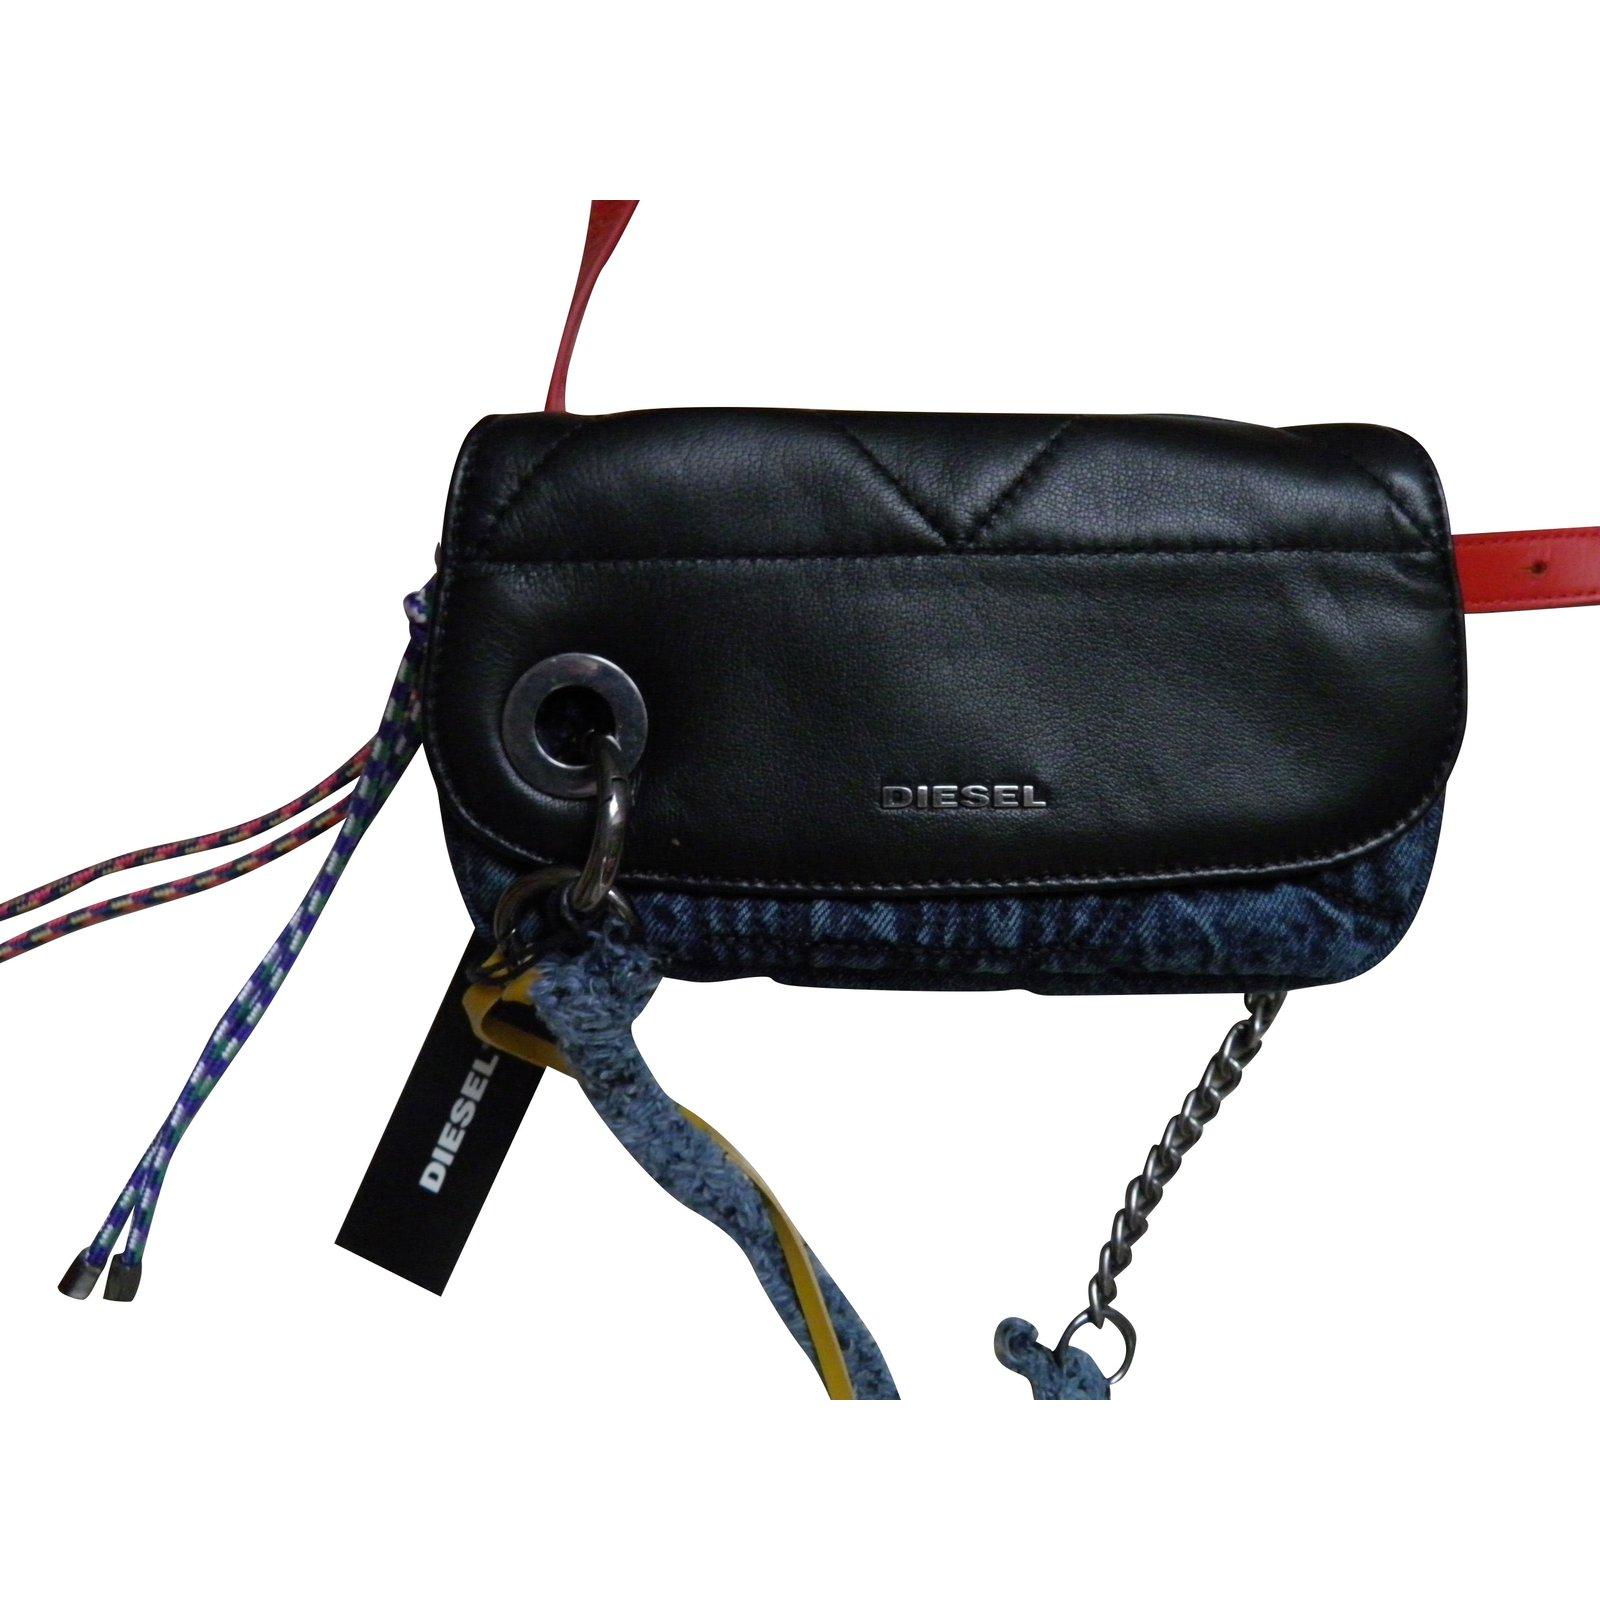 a00190f0160 Diesel belt bag Clutch bags Other Multiple colors ref.91382 - Joli ...